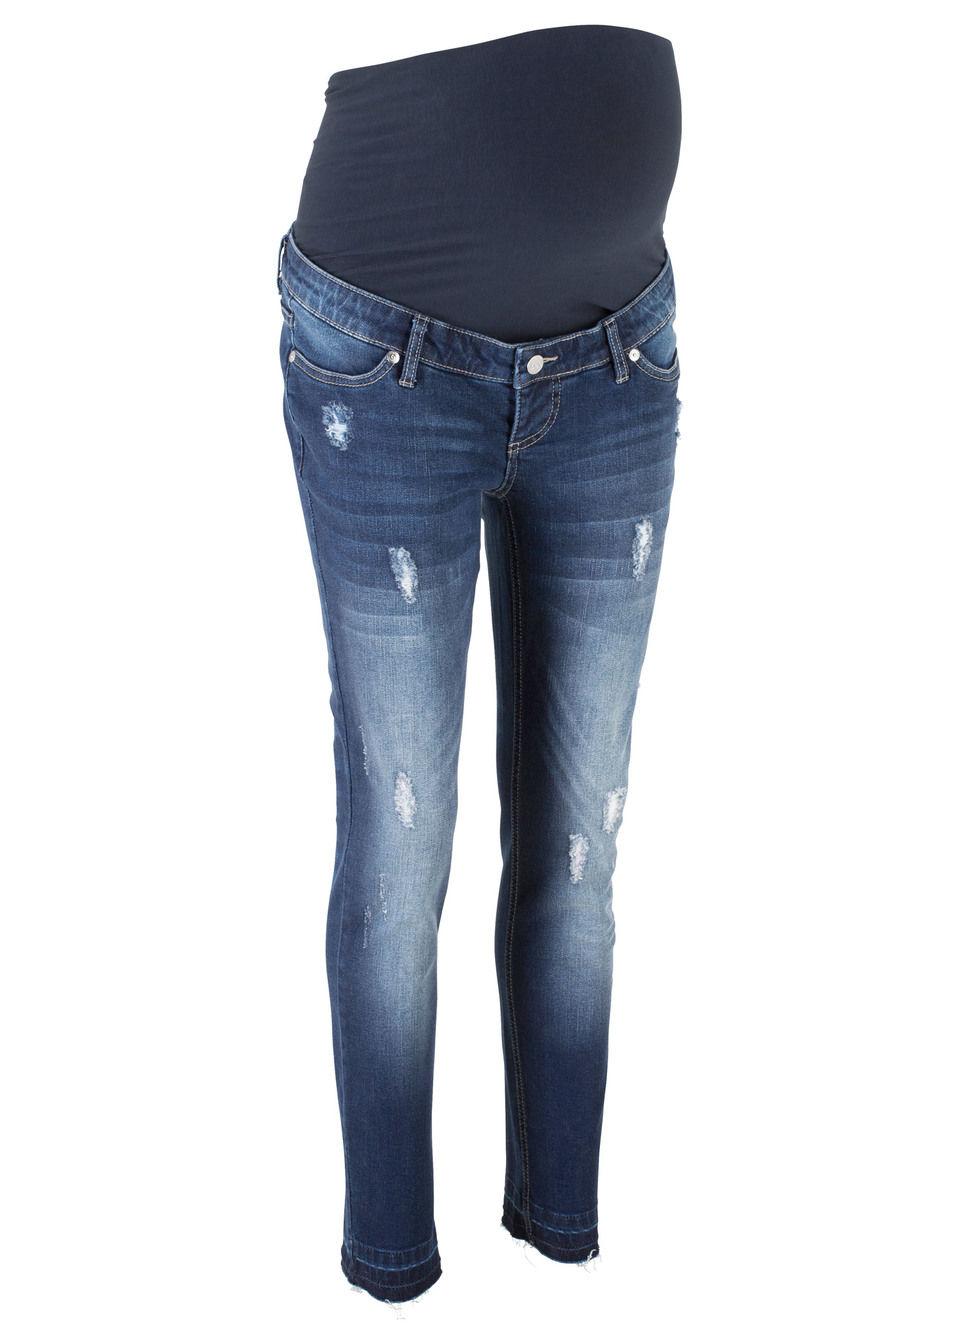 Jeans gravide bonprix